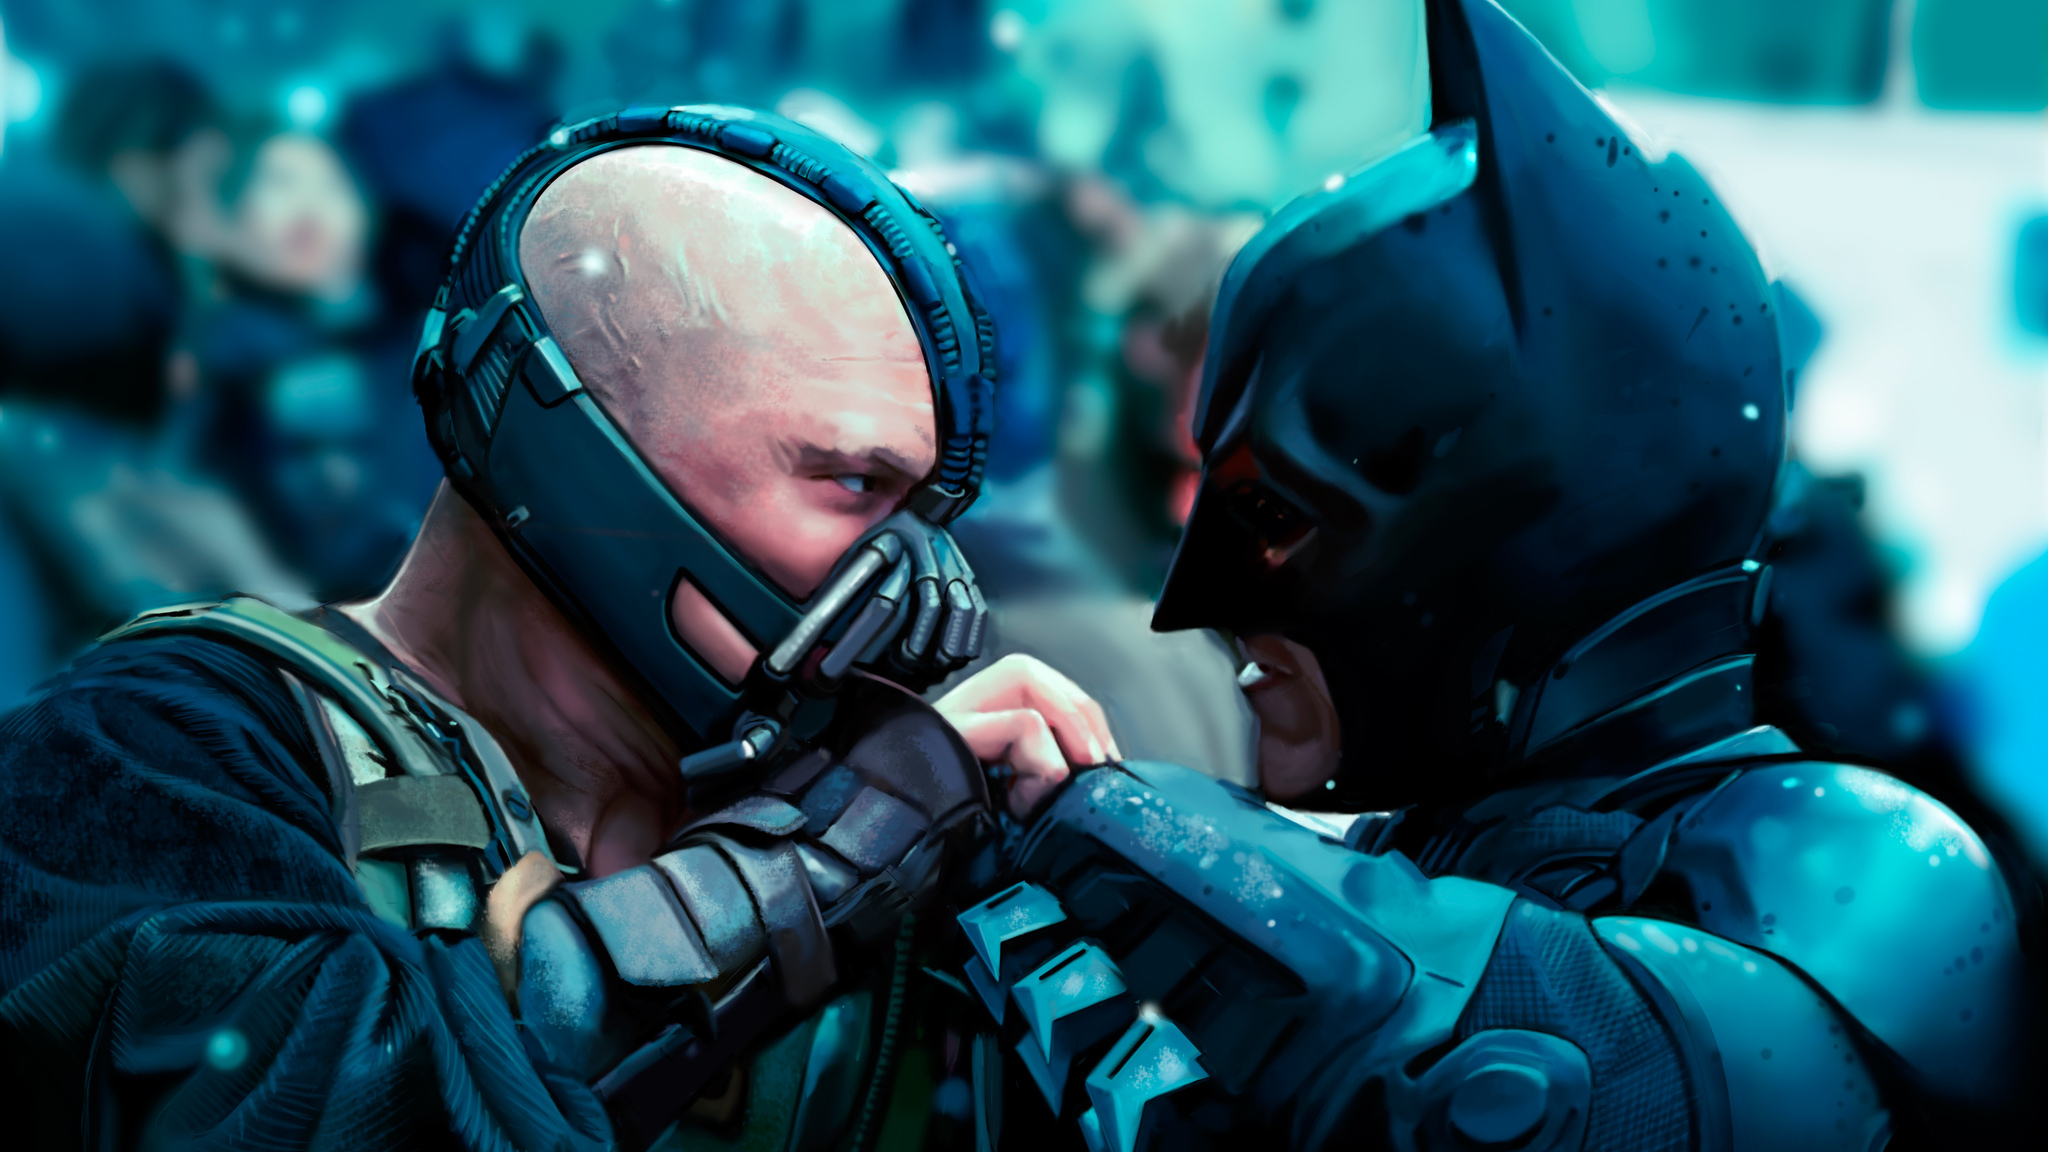 Bane In Batman Dark Knight Rises